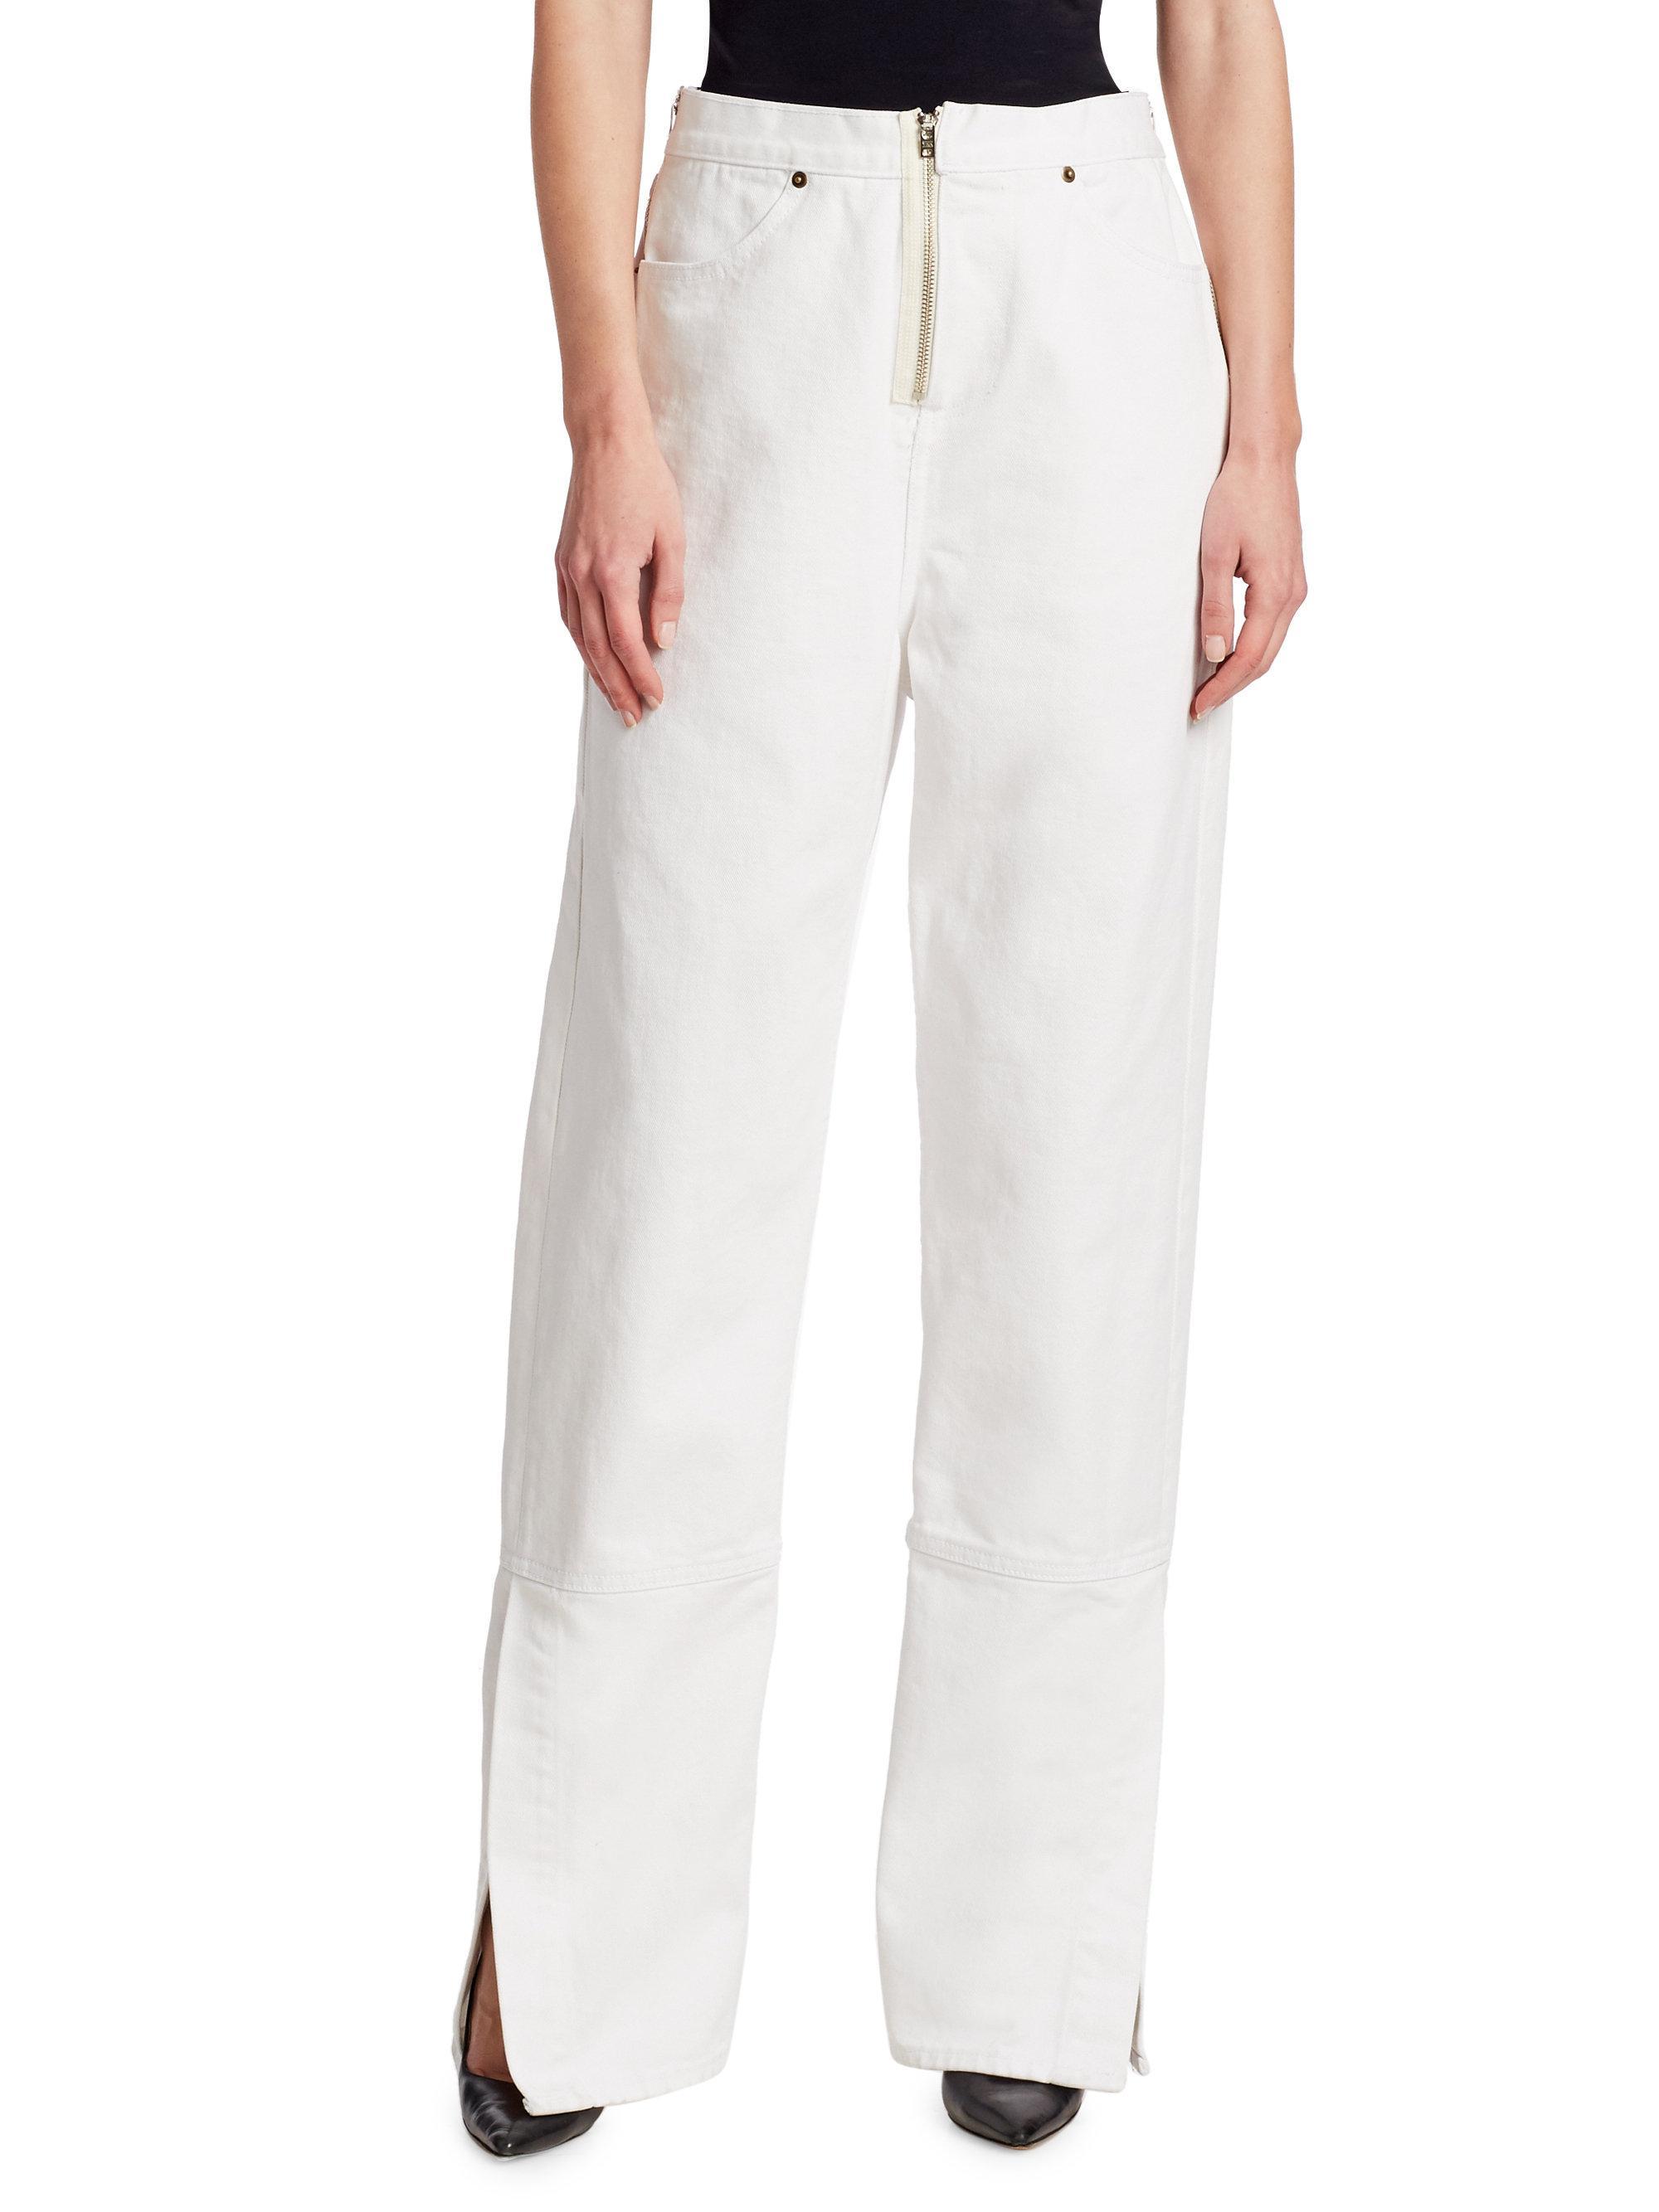 Beth High-rise Straight-leg Jeans - White TRE by Natalie Ratabesi LUlgnVWtq6